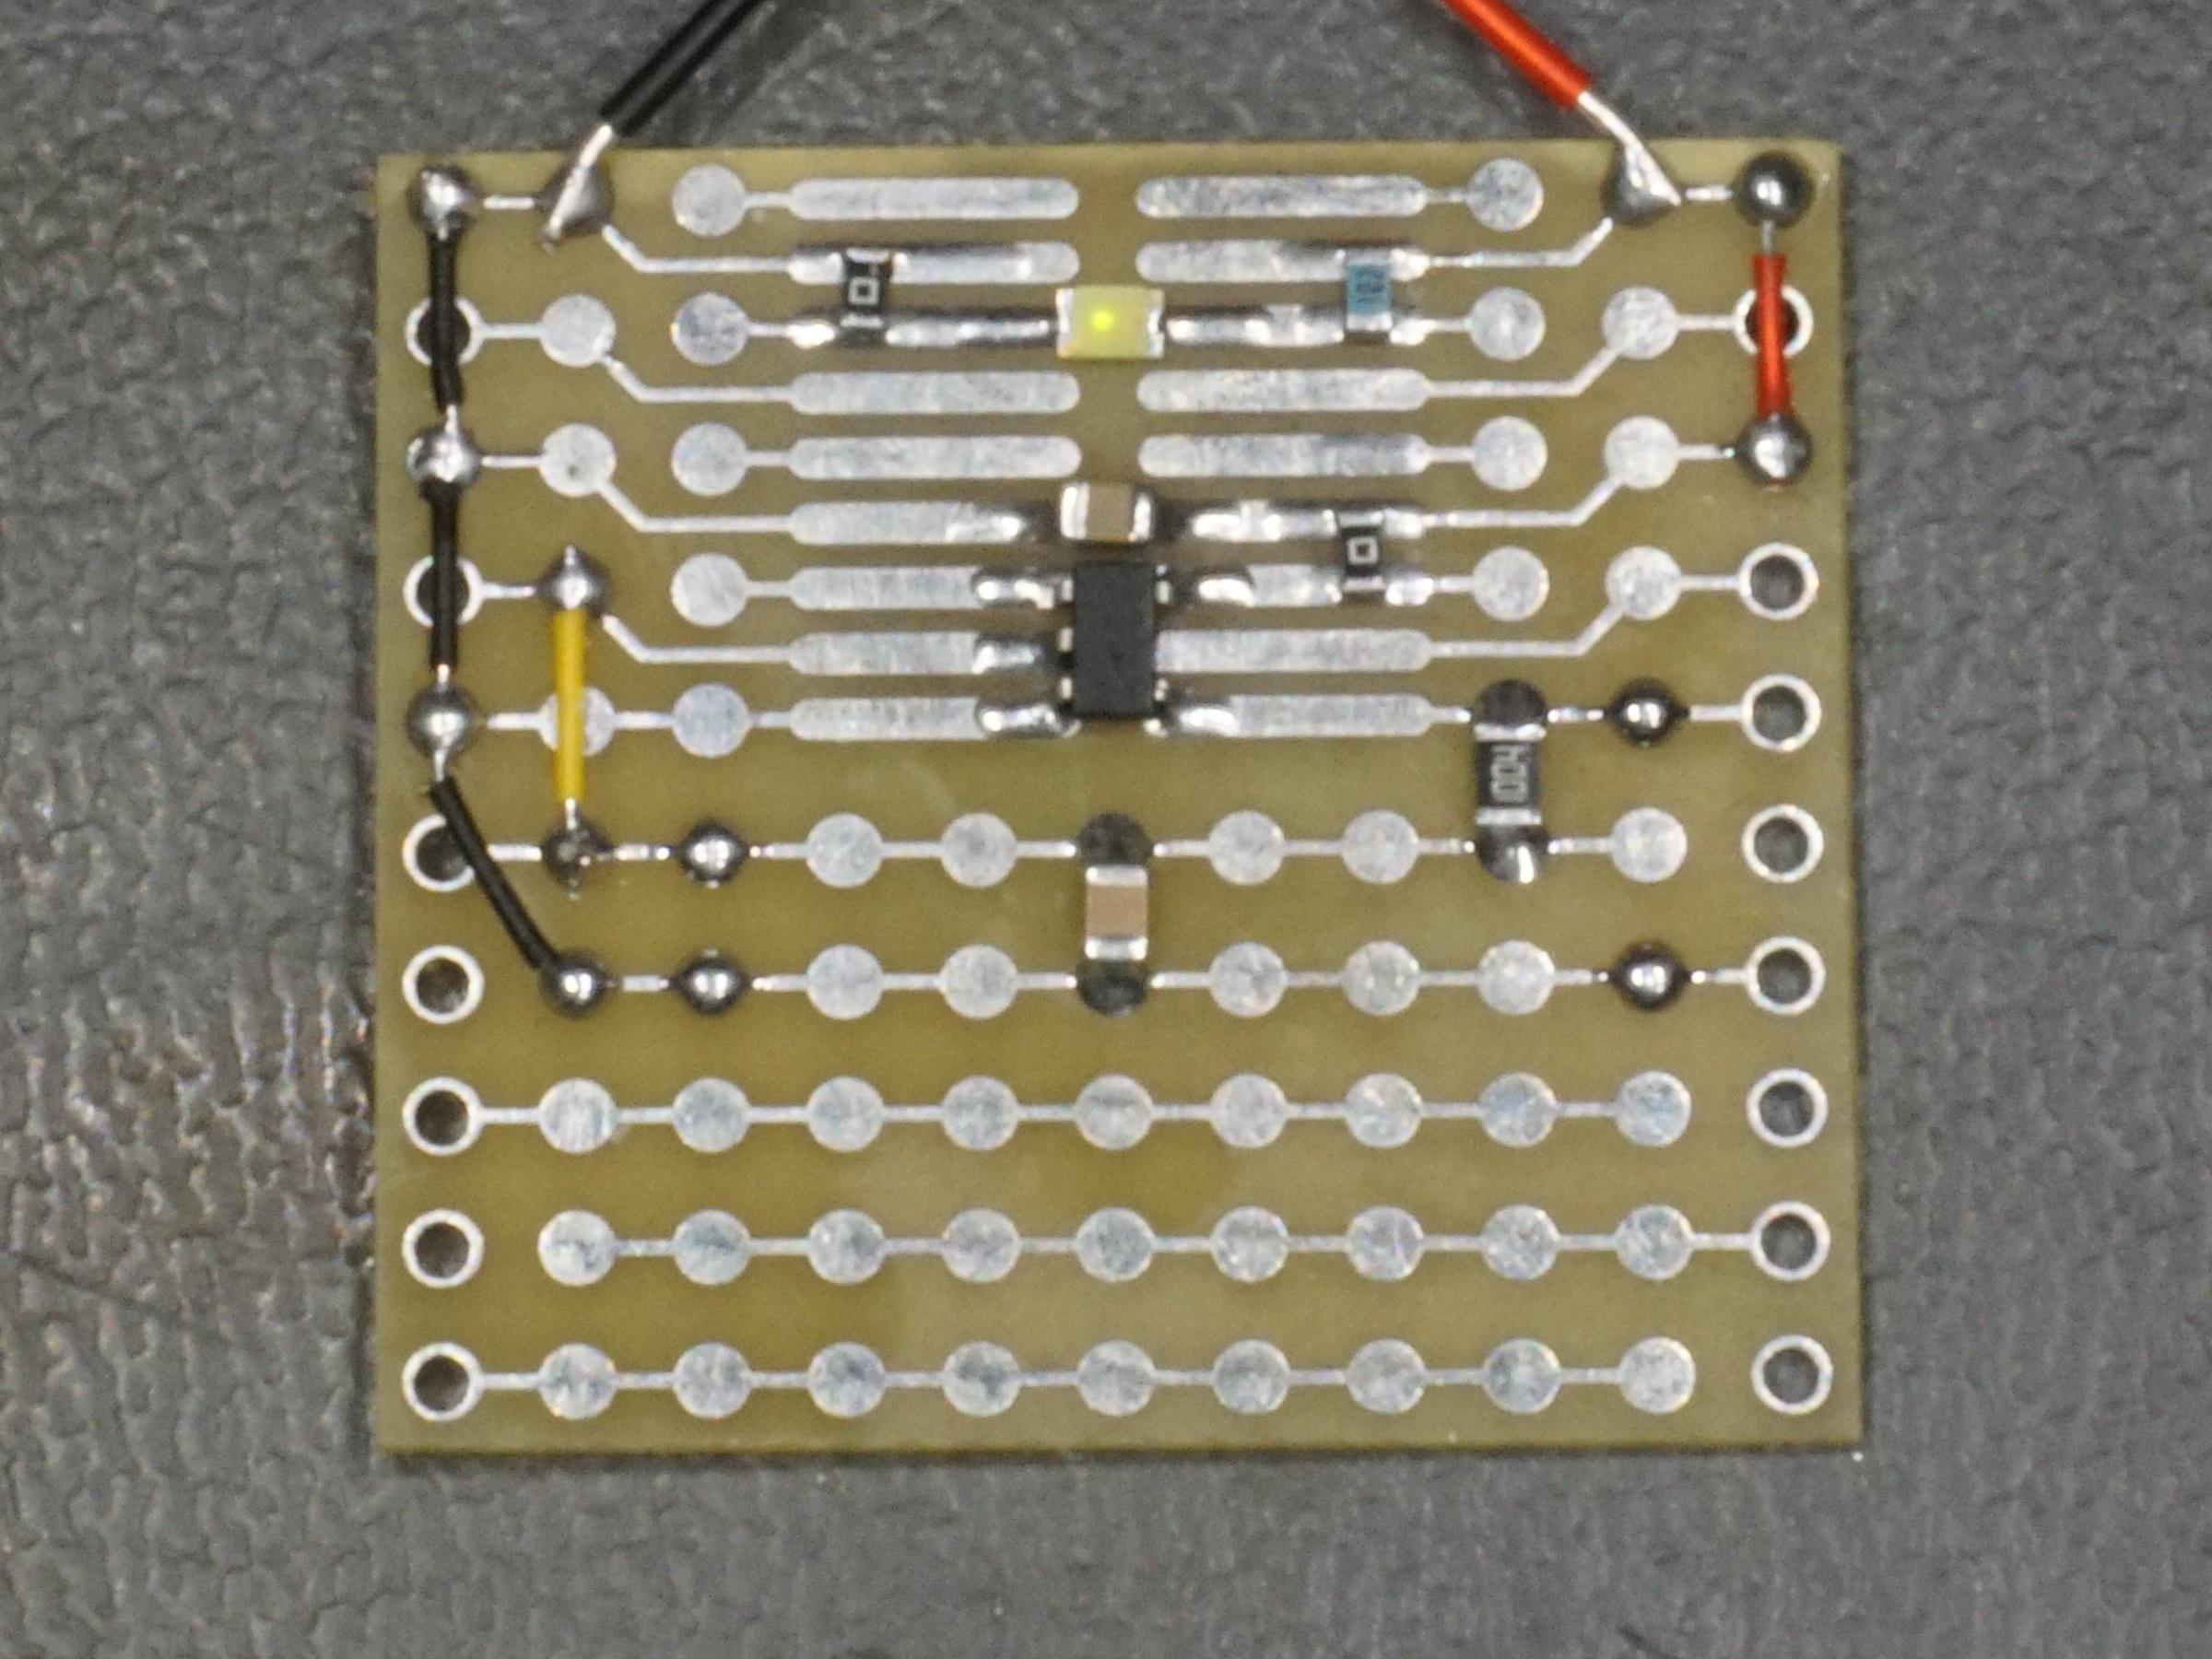 components_osc3-circuit.jpg